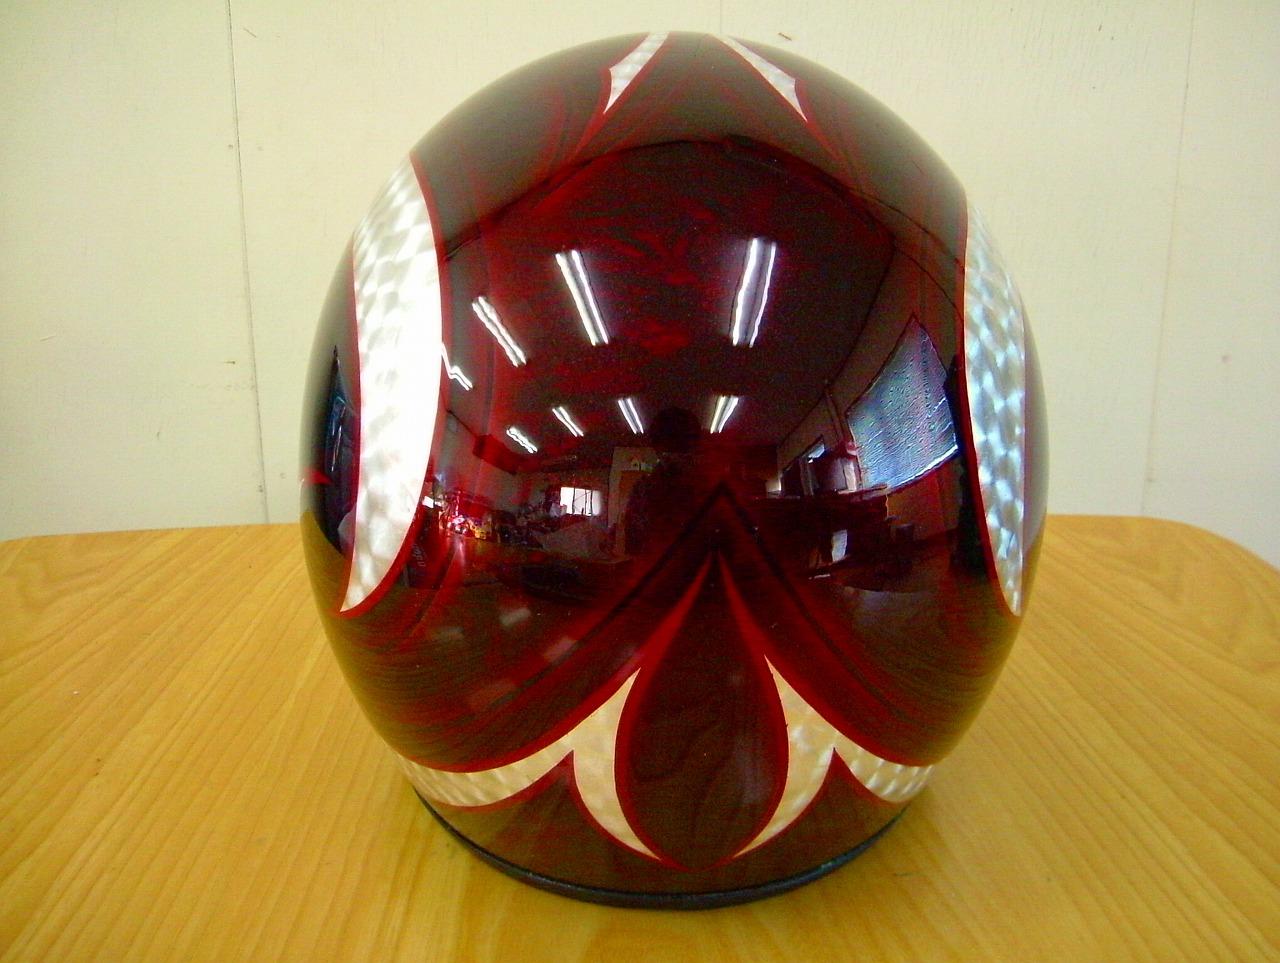 s-2003010108 (5)